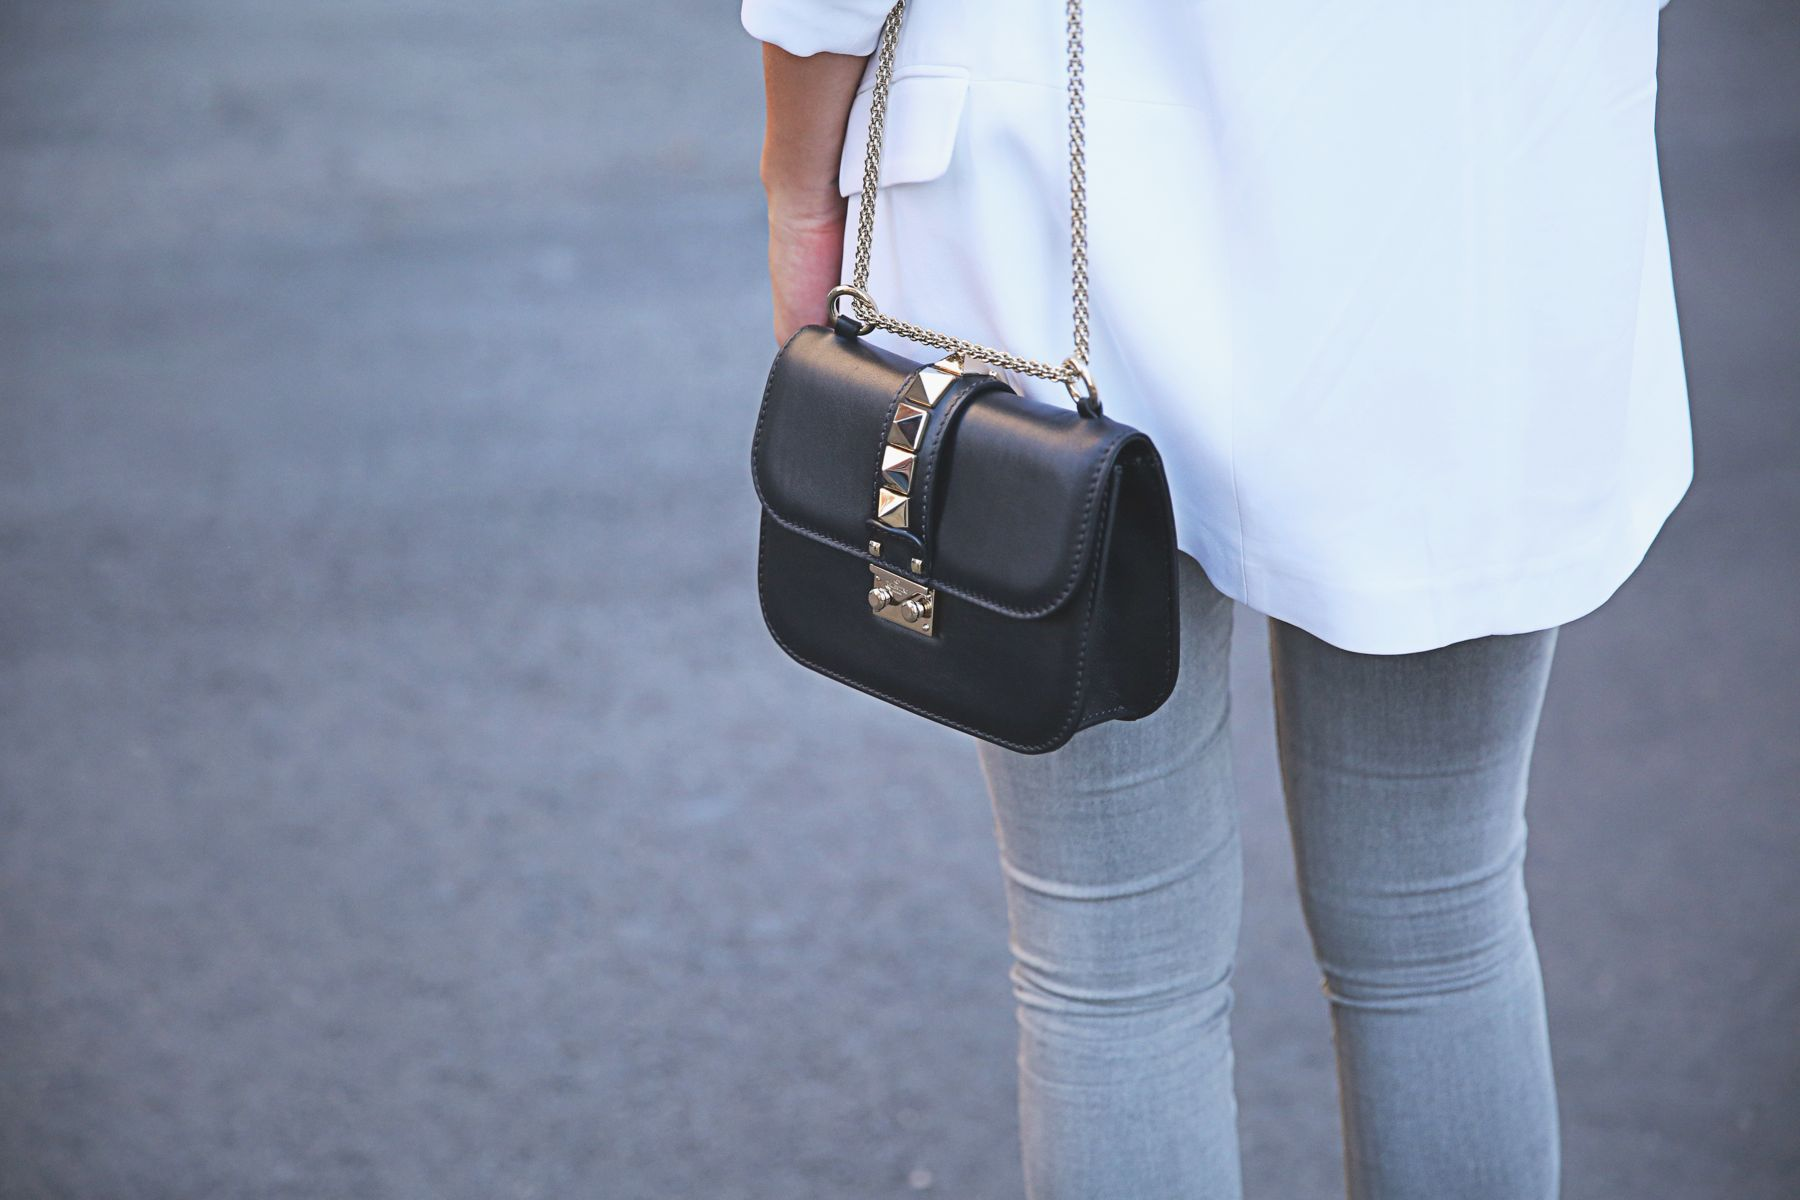 trendy-taste-look-outfit-street-style-ootd-blog-blogger-fashion-spain-moda-españa-SS15-verano2015-tendencias-trends-zara-buylevard-valentino-jessica-simpson-skinny-jeans-grey-white-blazer-americana-blanca-vaqueros-pitillo-sandalias-sandals-etnicas-10